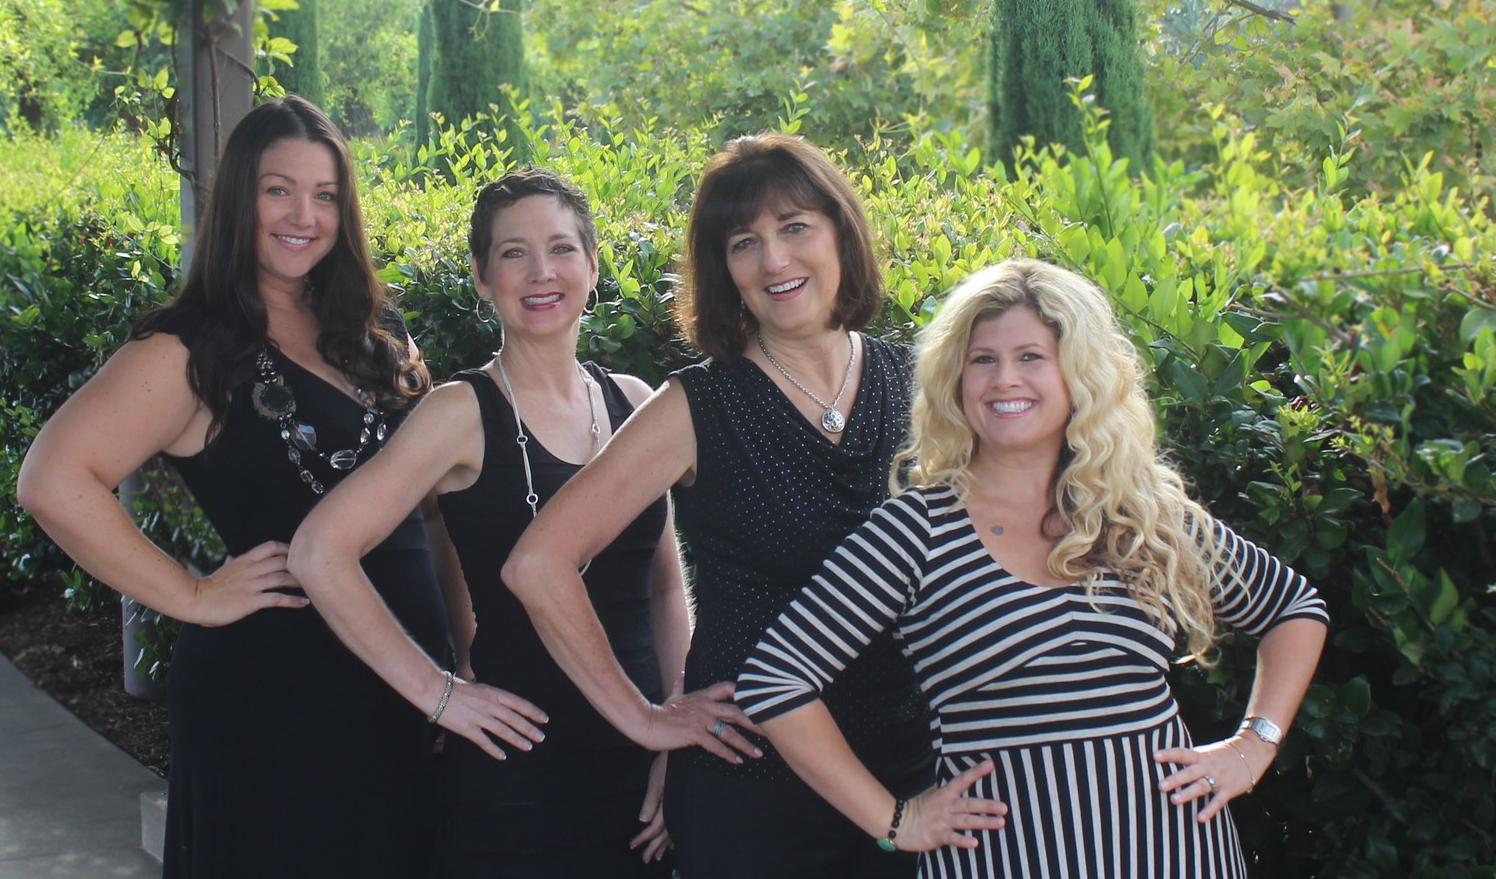 My amazing Designer Runway Team! (From Right to Left) Valerie: Team Captain, Cheryl, Jan, Sarah